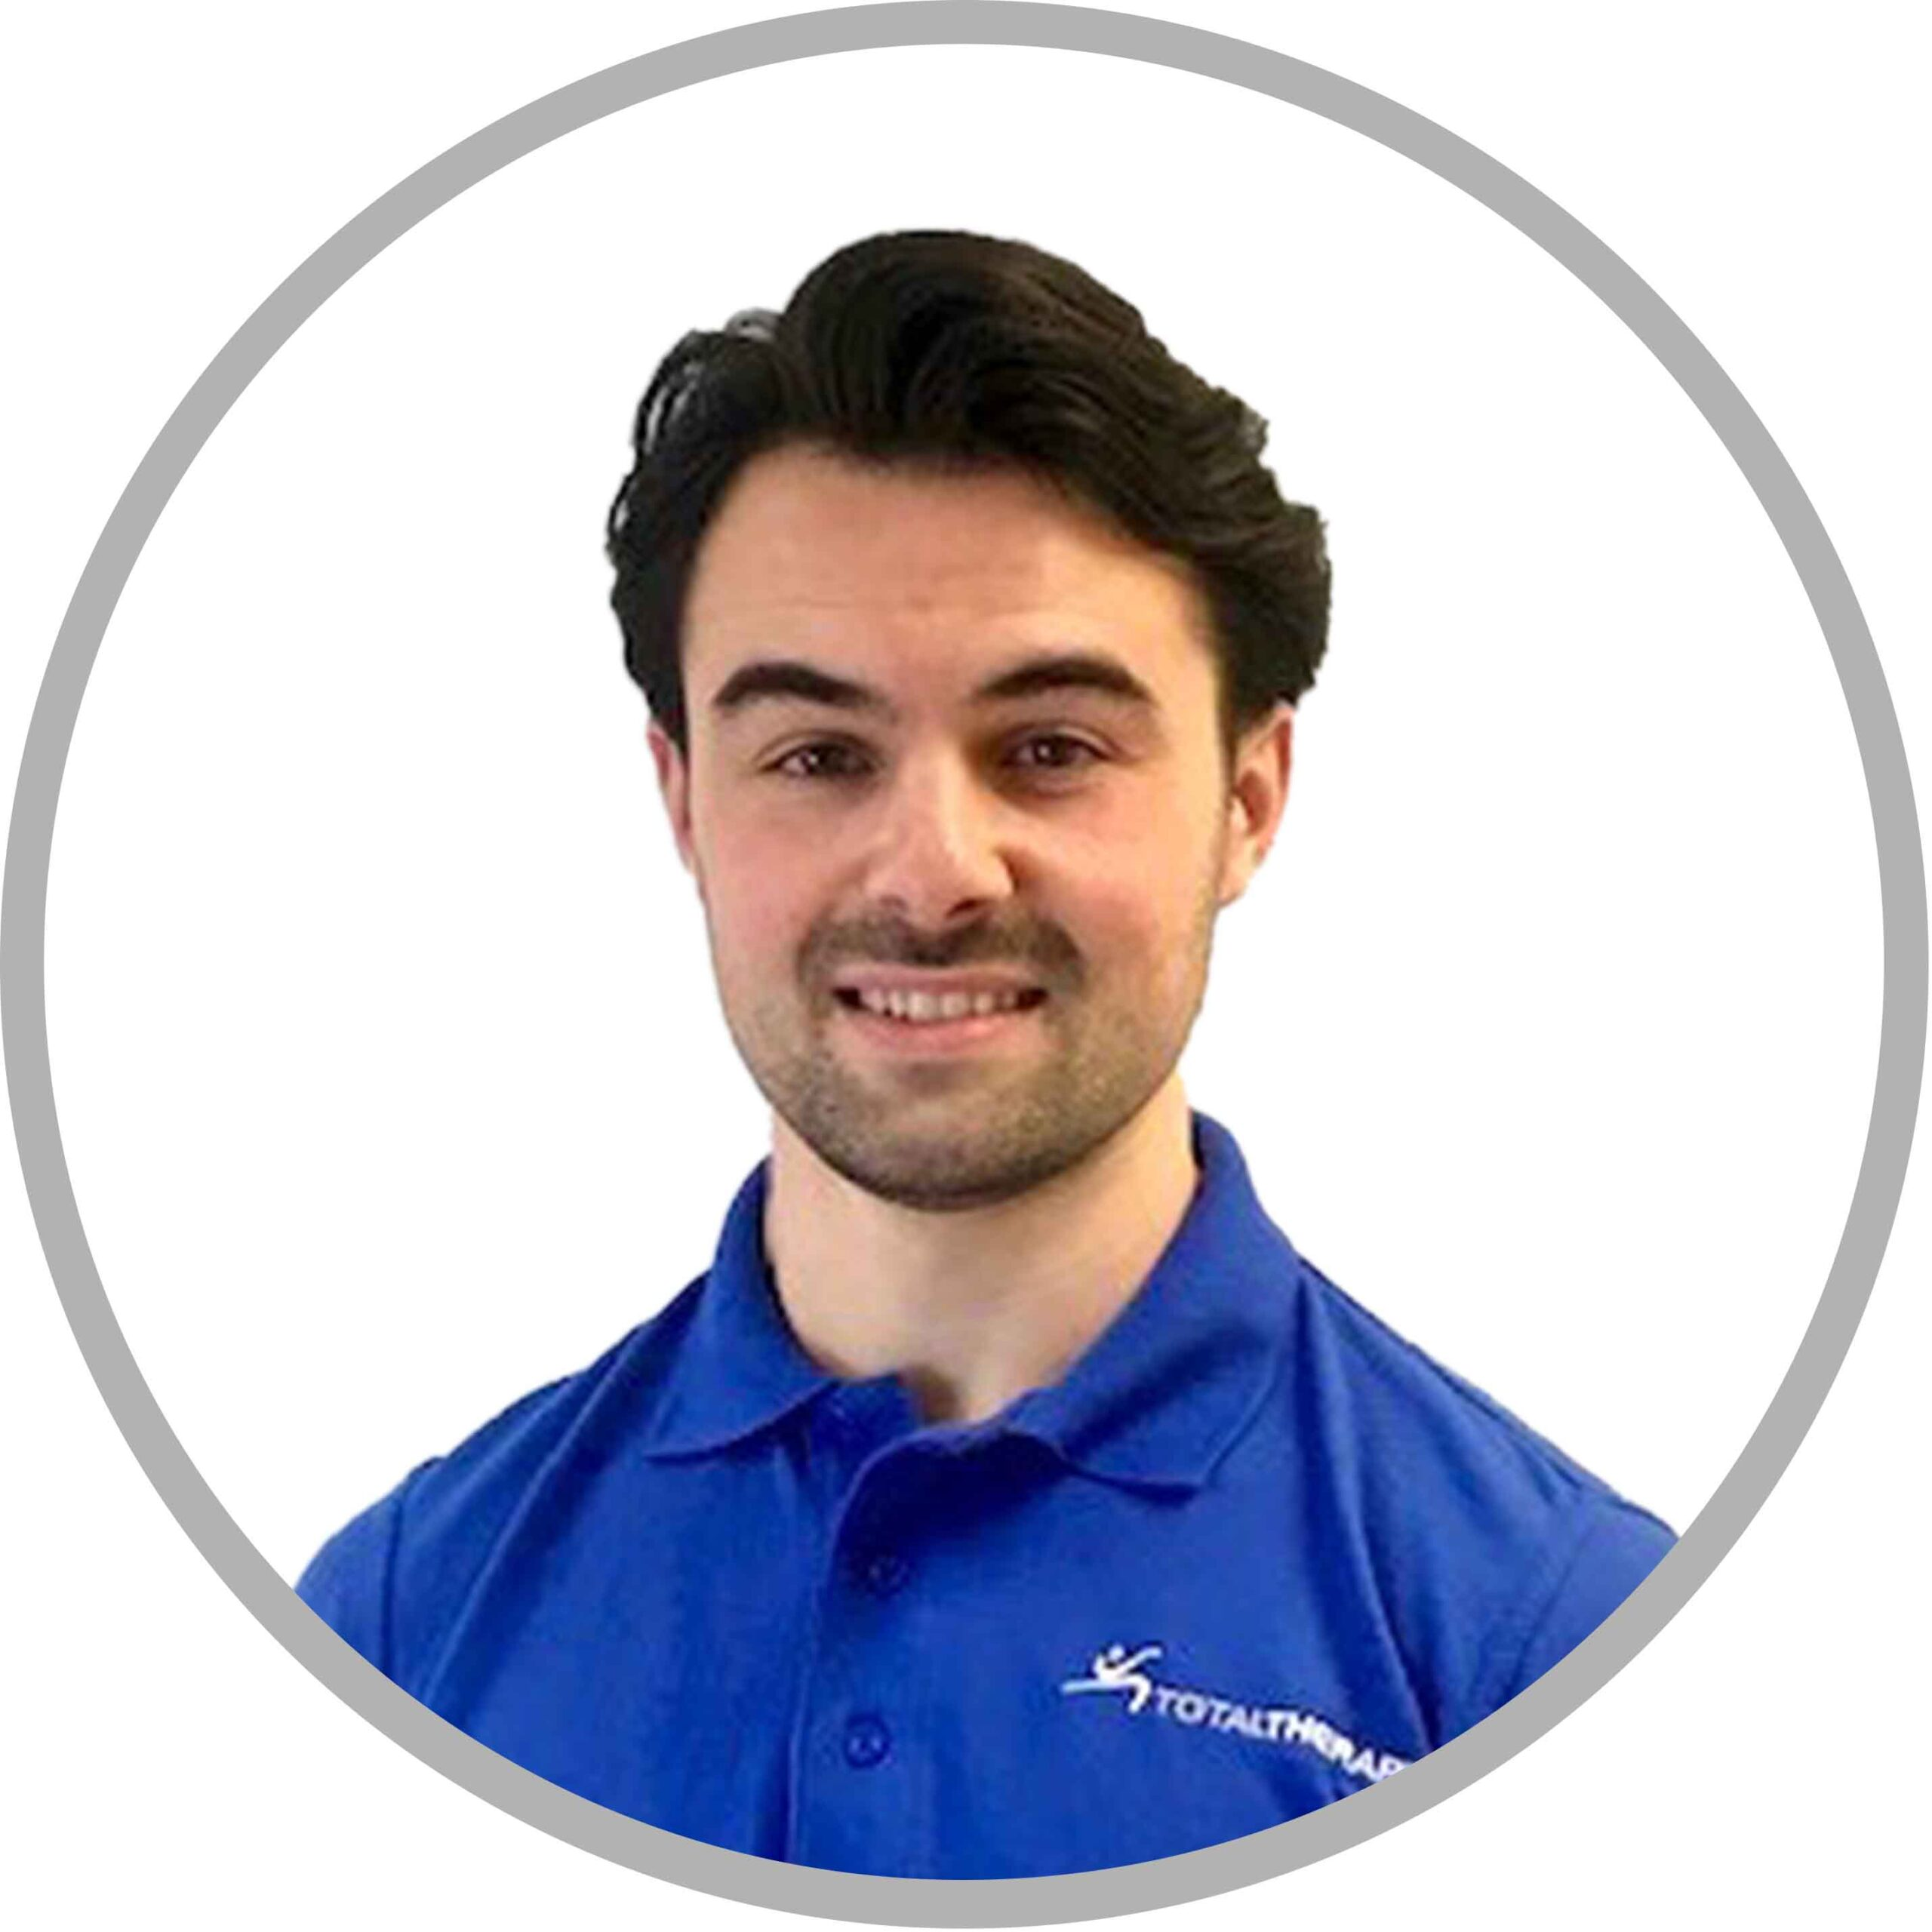 Sam Chapman - Sports Massage therapist at Lilliput Health in Poole